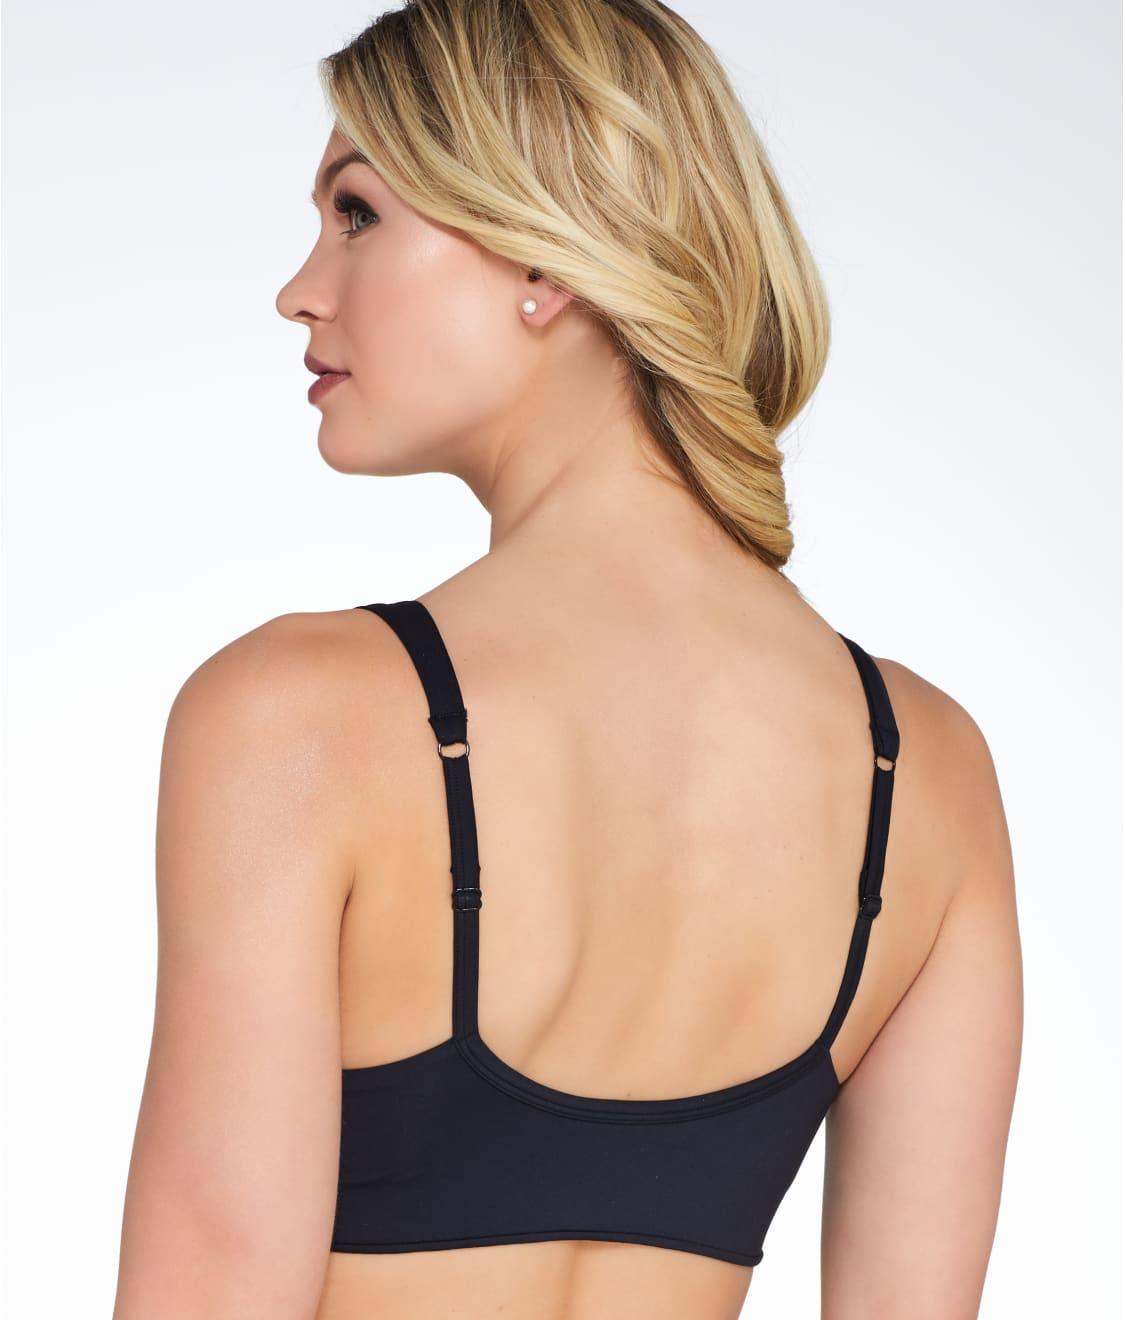 eb94d22fed3 Bravado Designs Ballet Wire-Free Nursing Bra